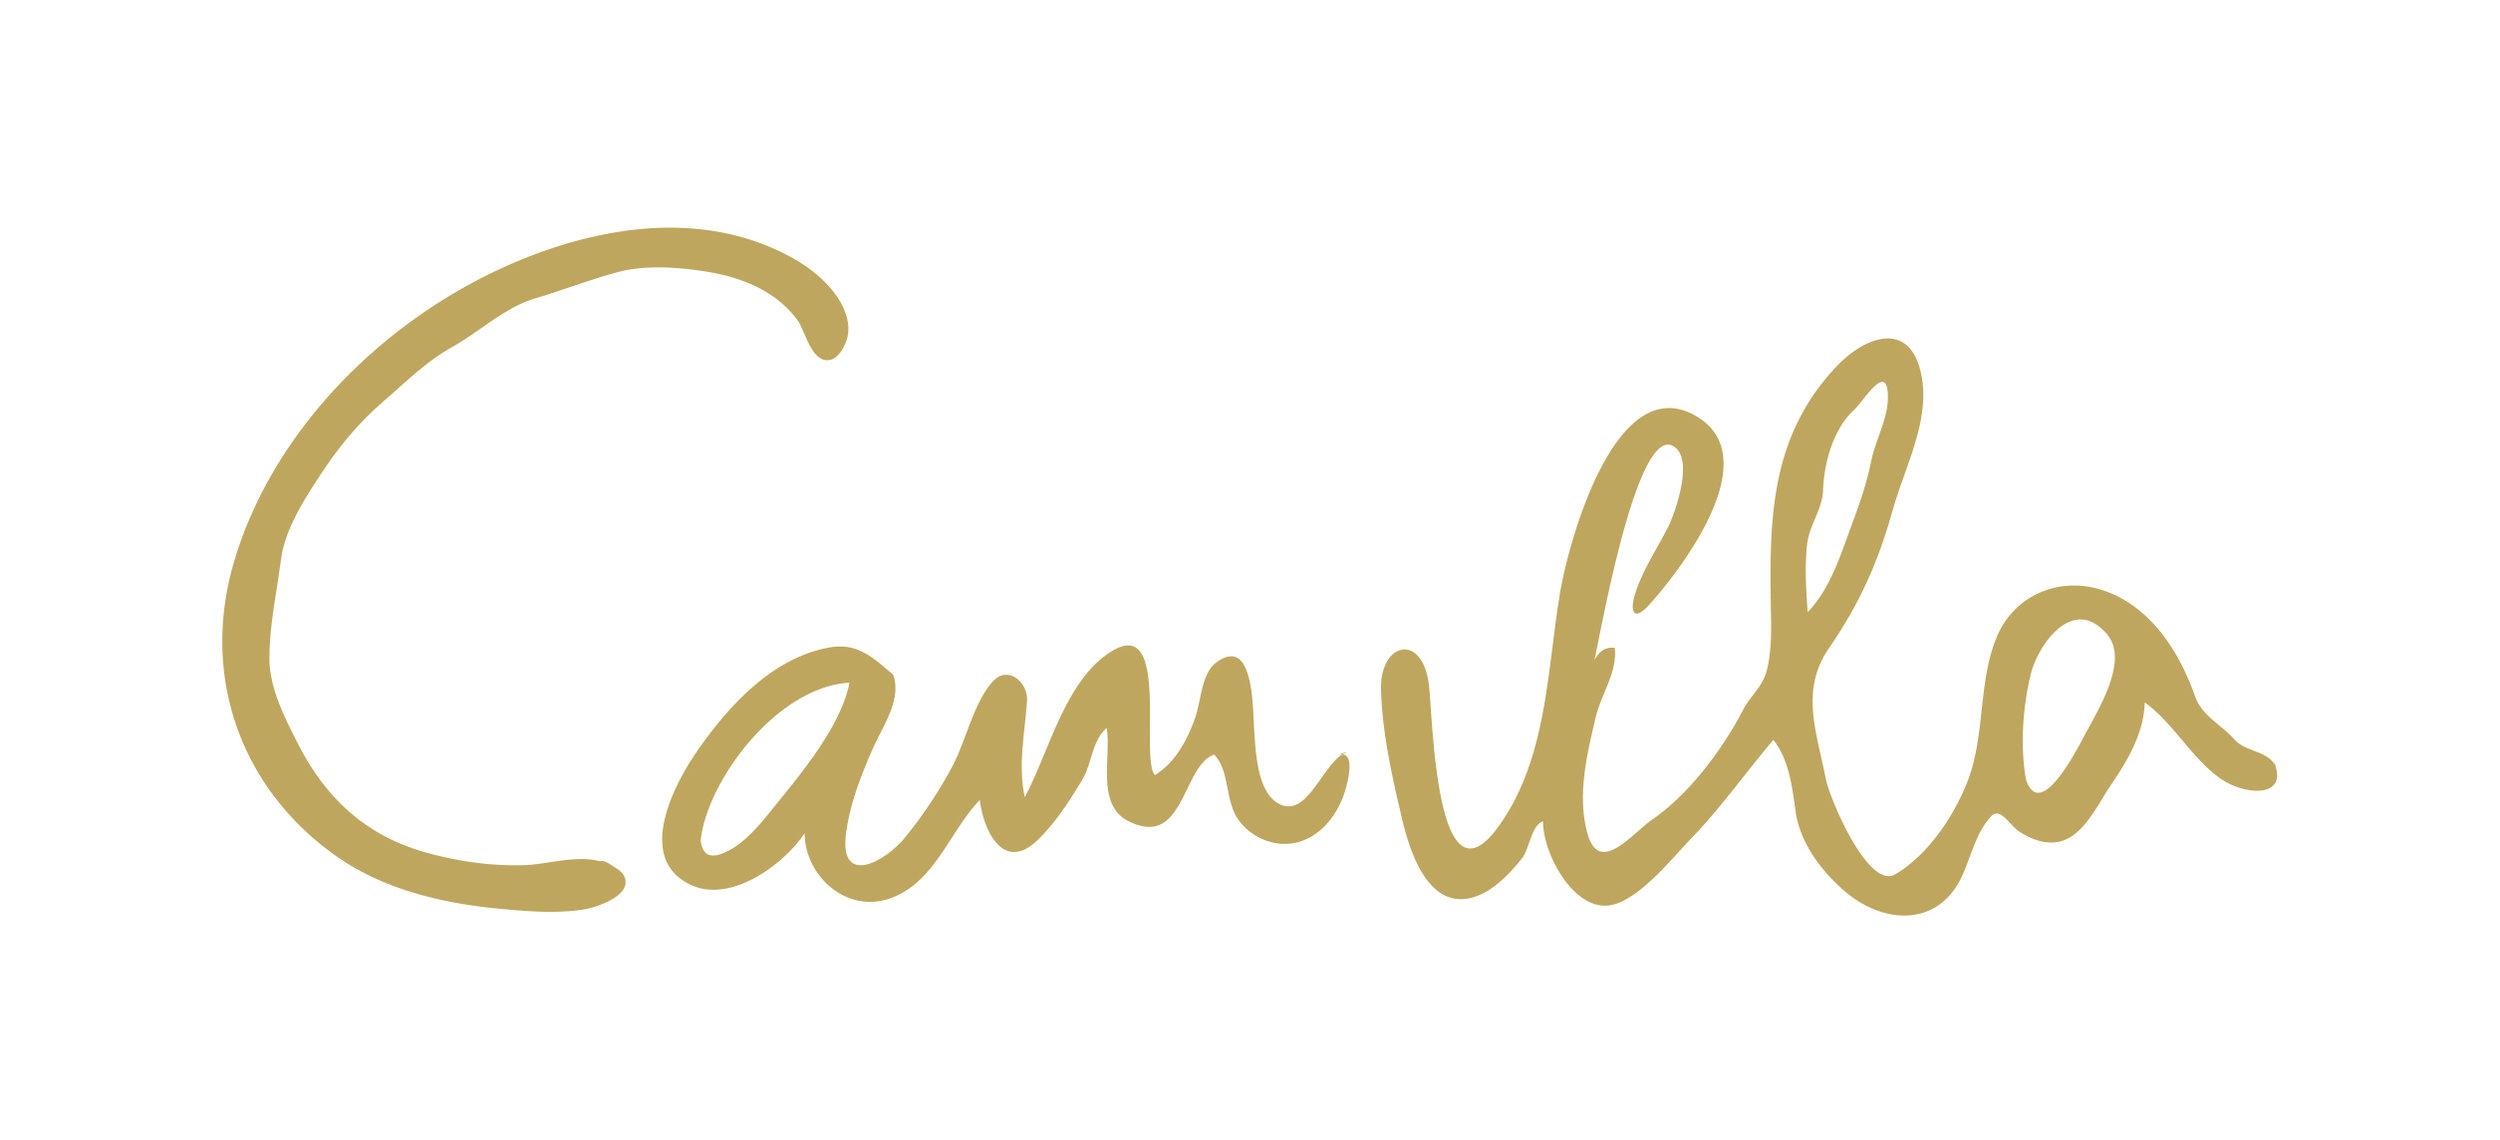 Camilla_Logo_Gold.jpg